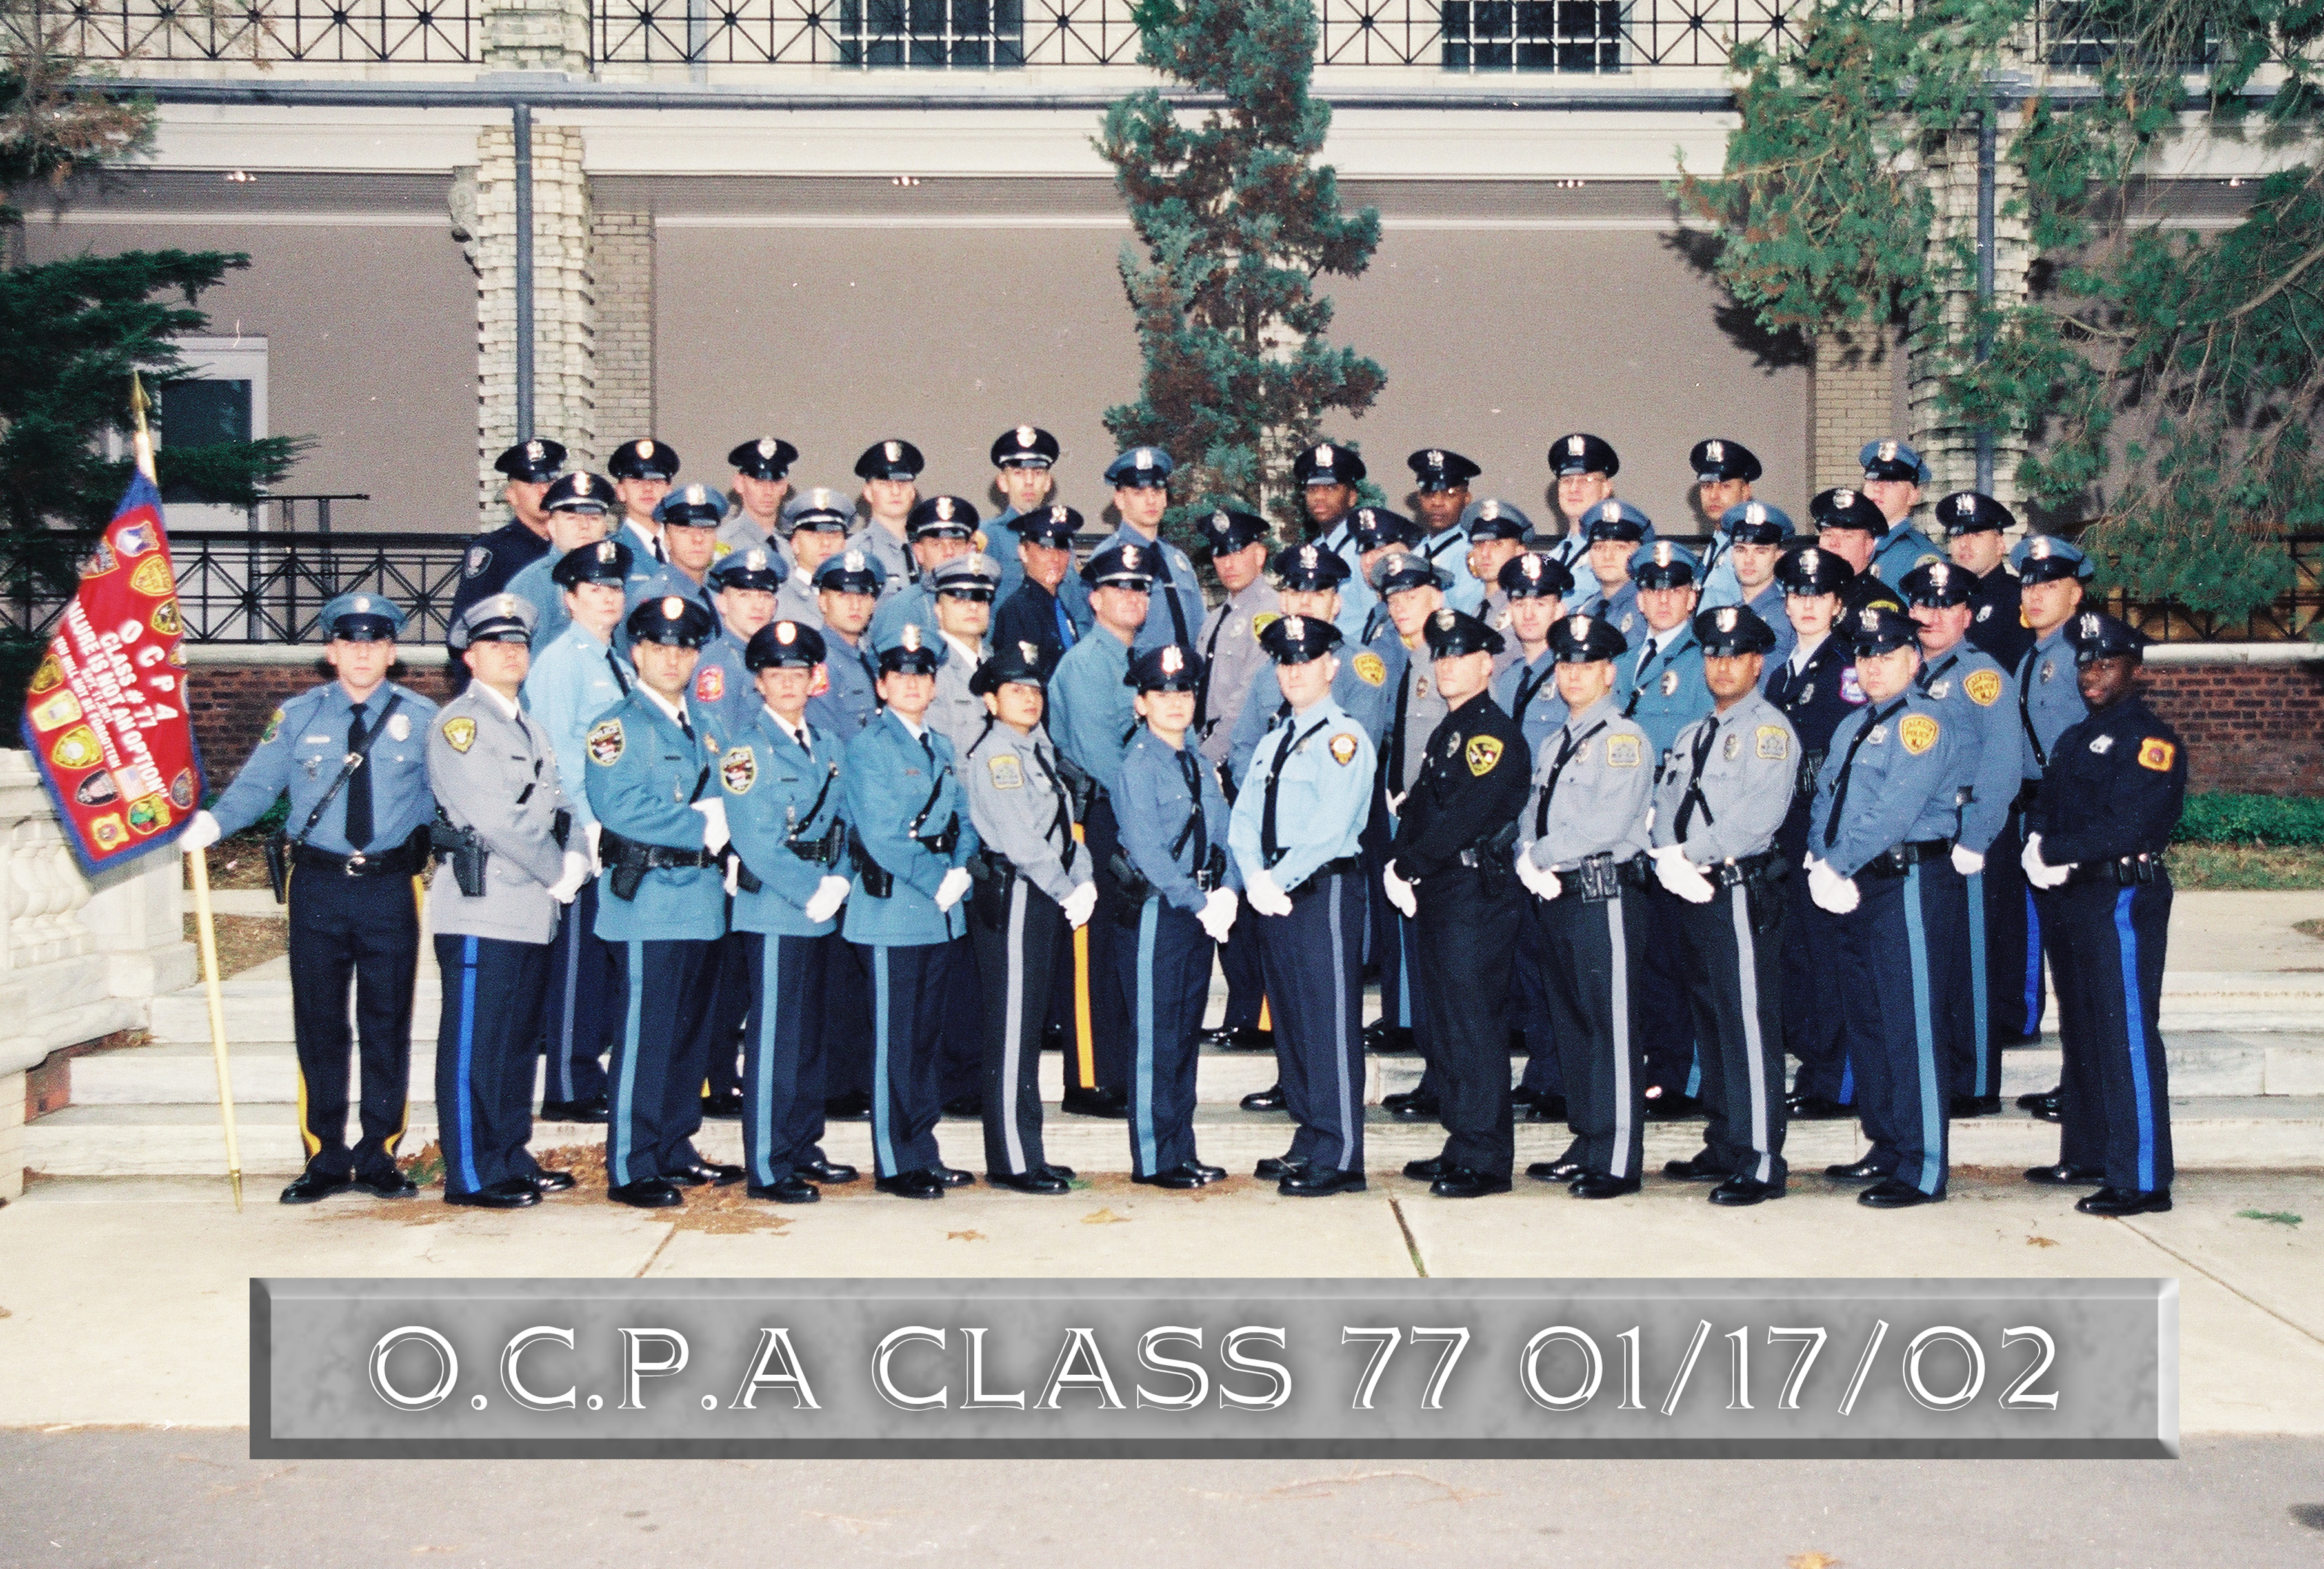 Class #77